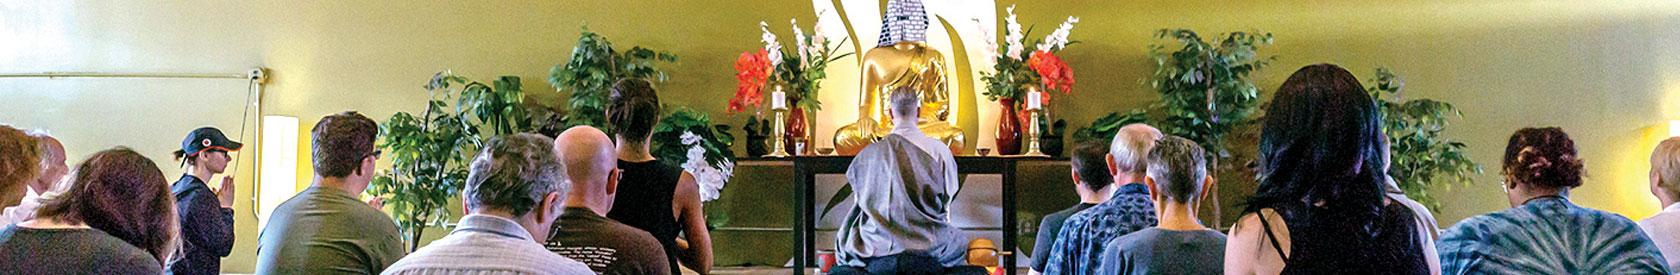 Place of Worship Tours – Dharma Gate Zen Center